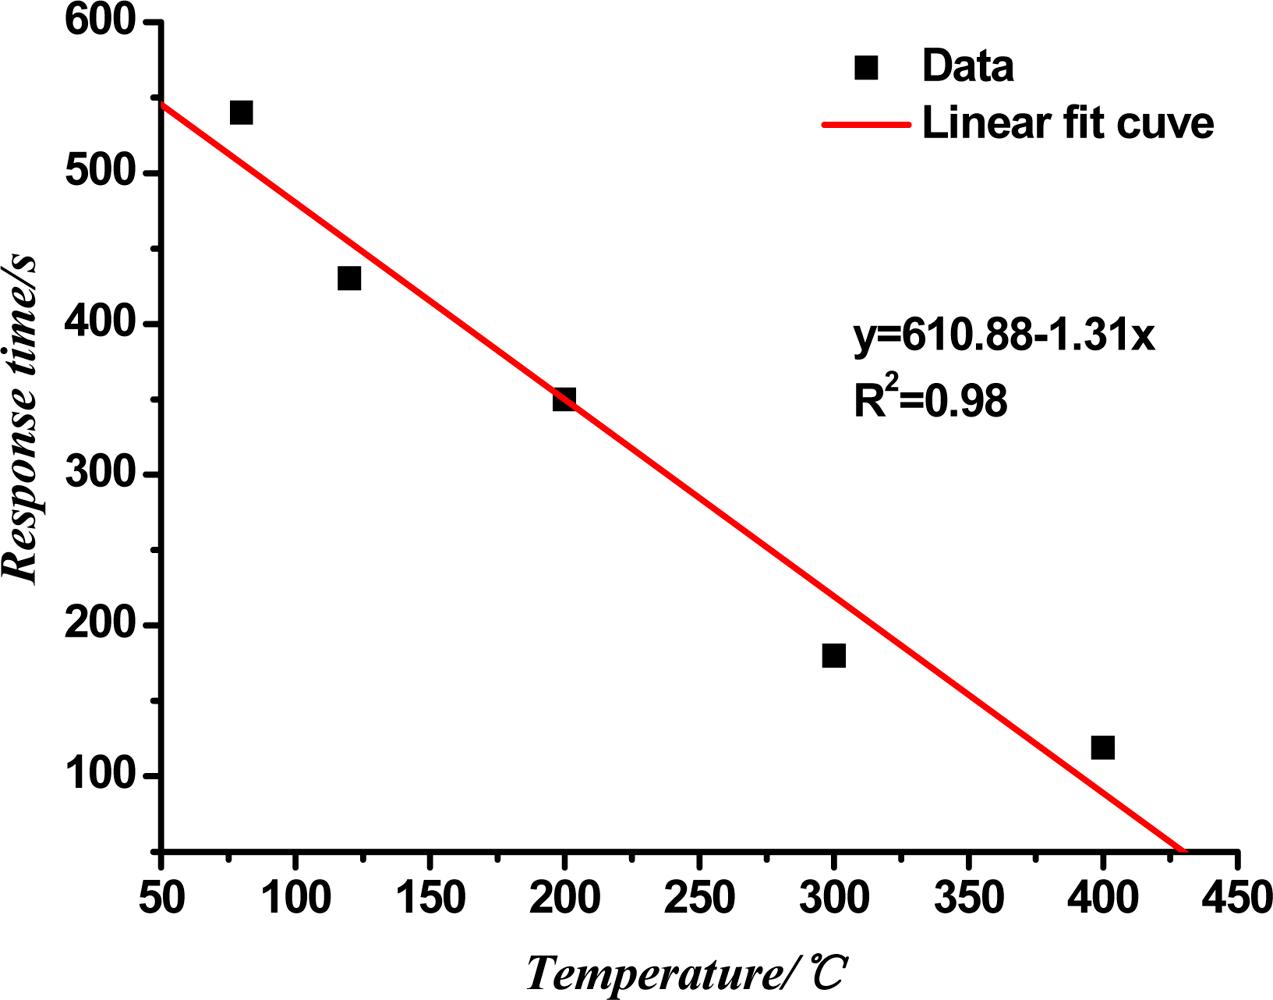 Temperature Sensor Response Time